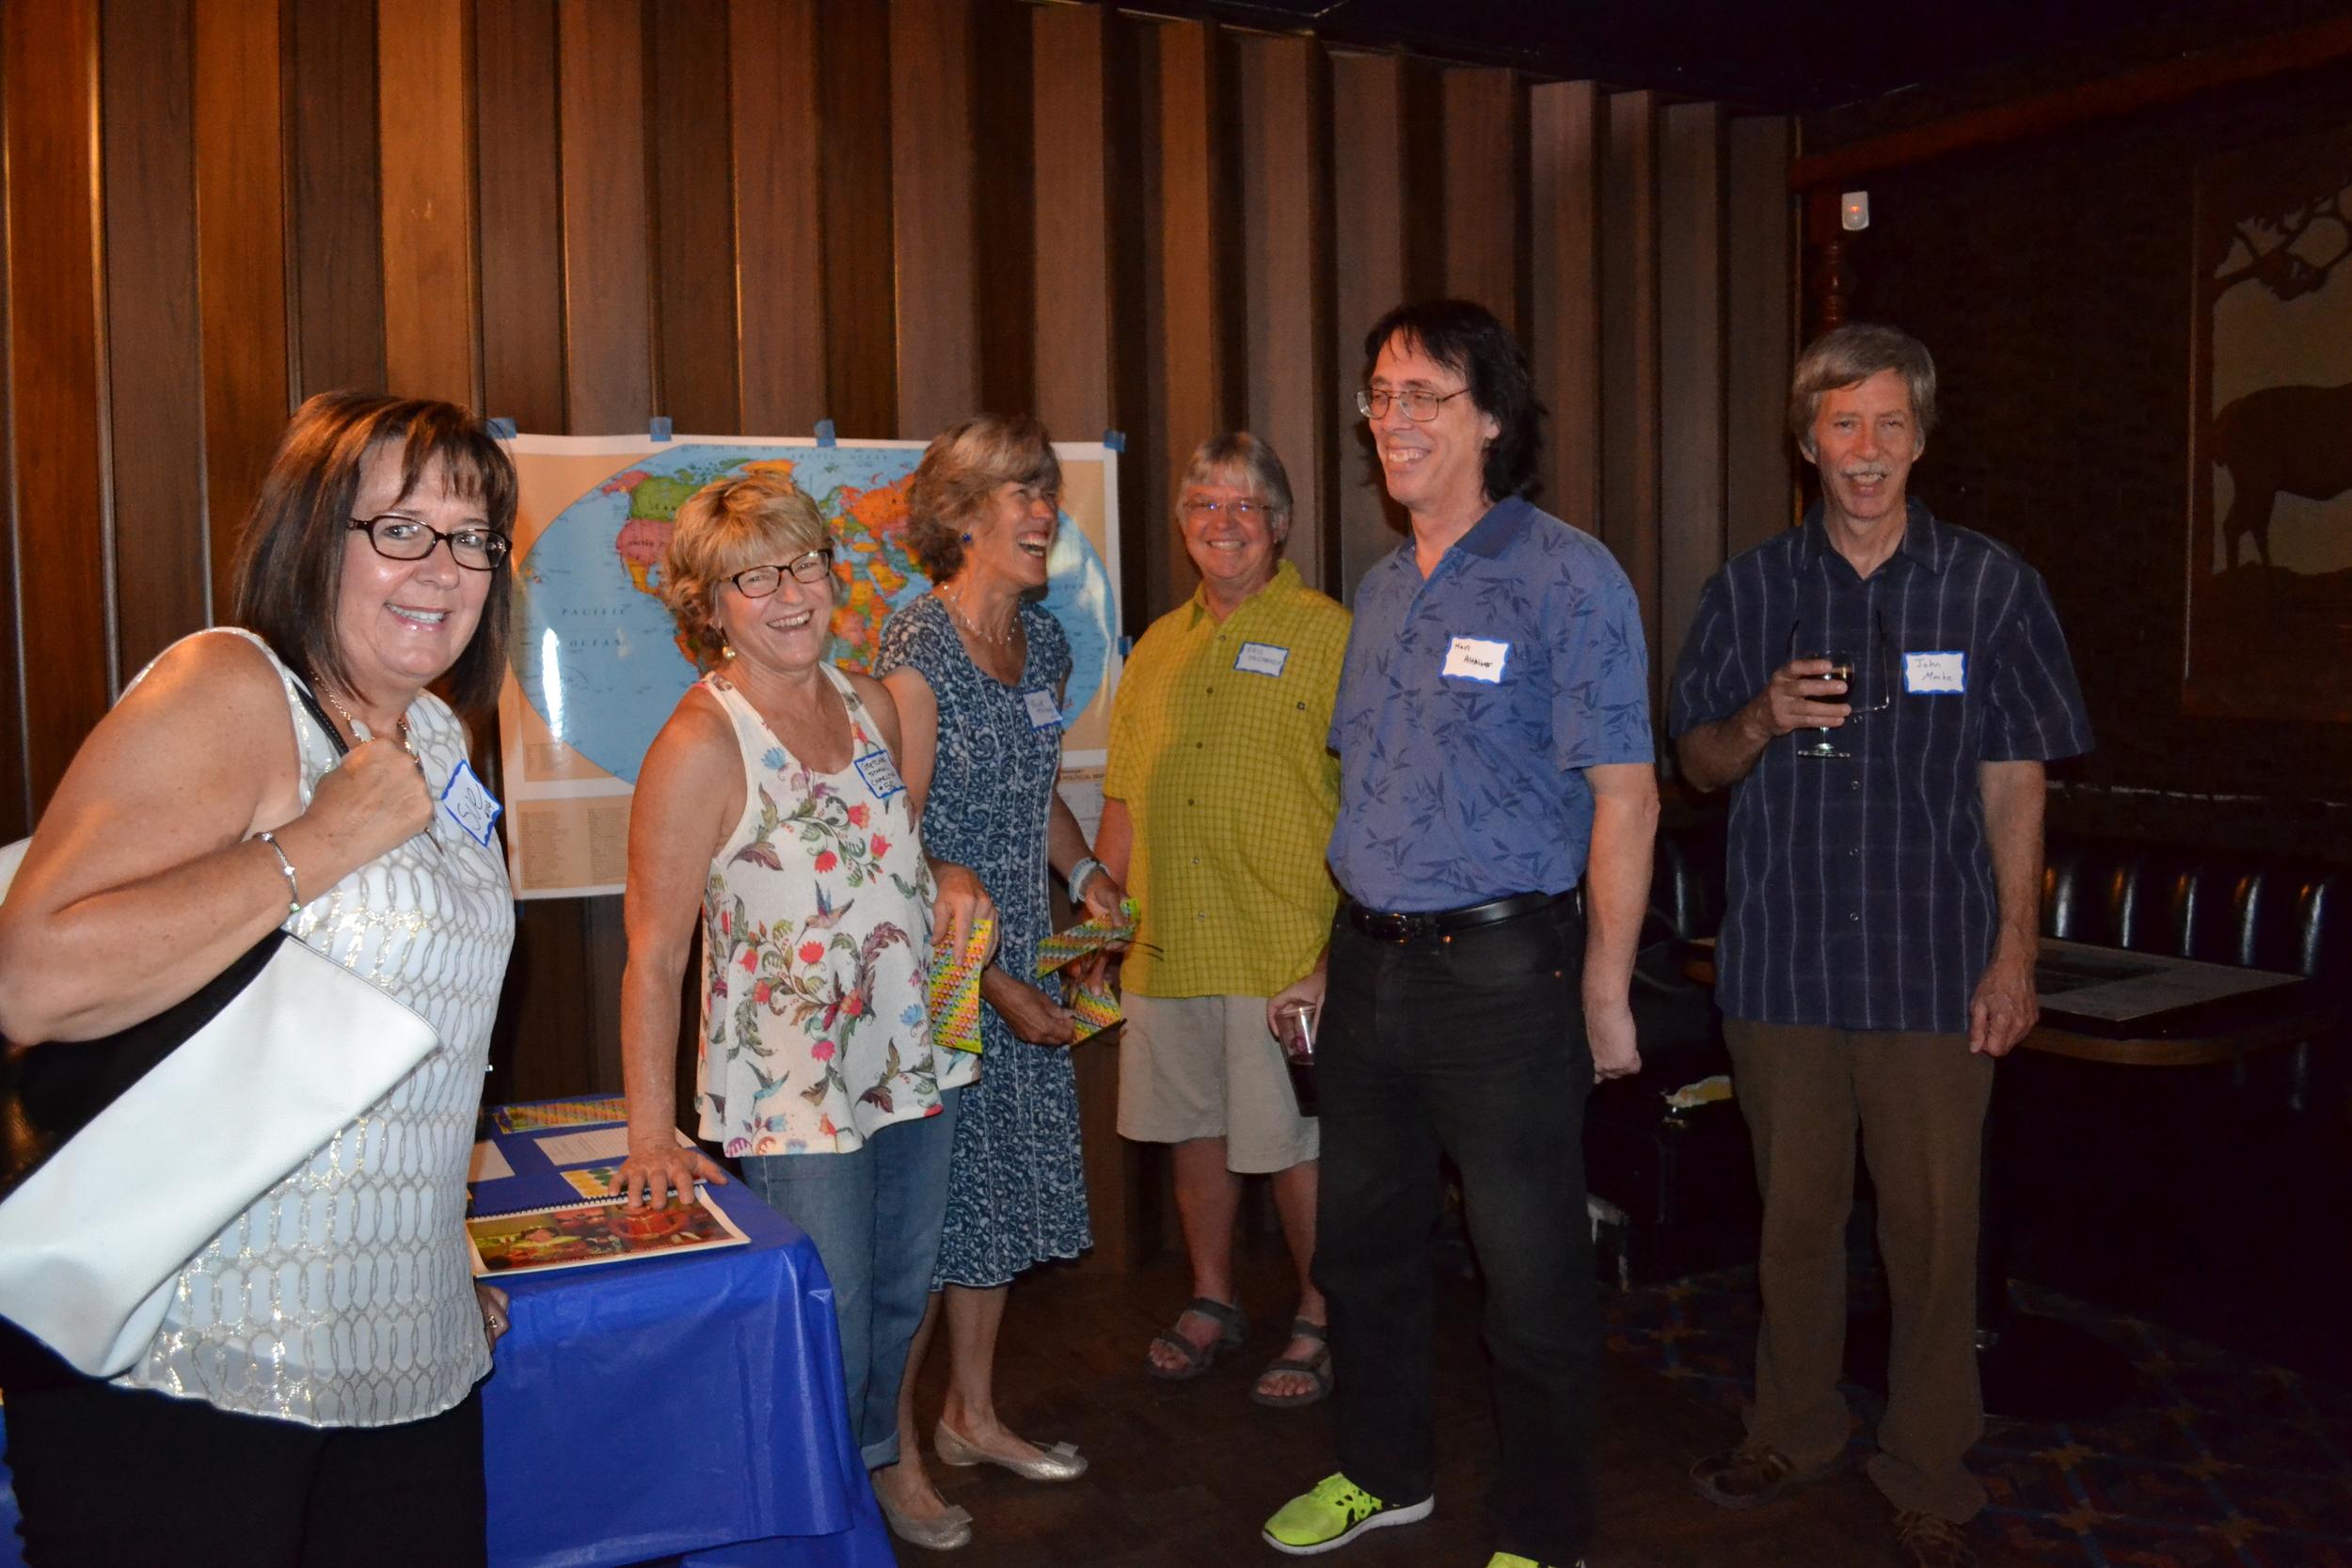 At the reunion: Sue; Gretchen Charlton; Lisa and Eric McCready; Ken Althiser; John Menke